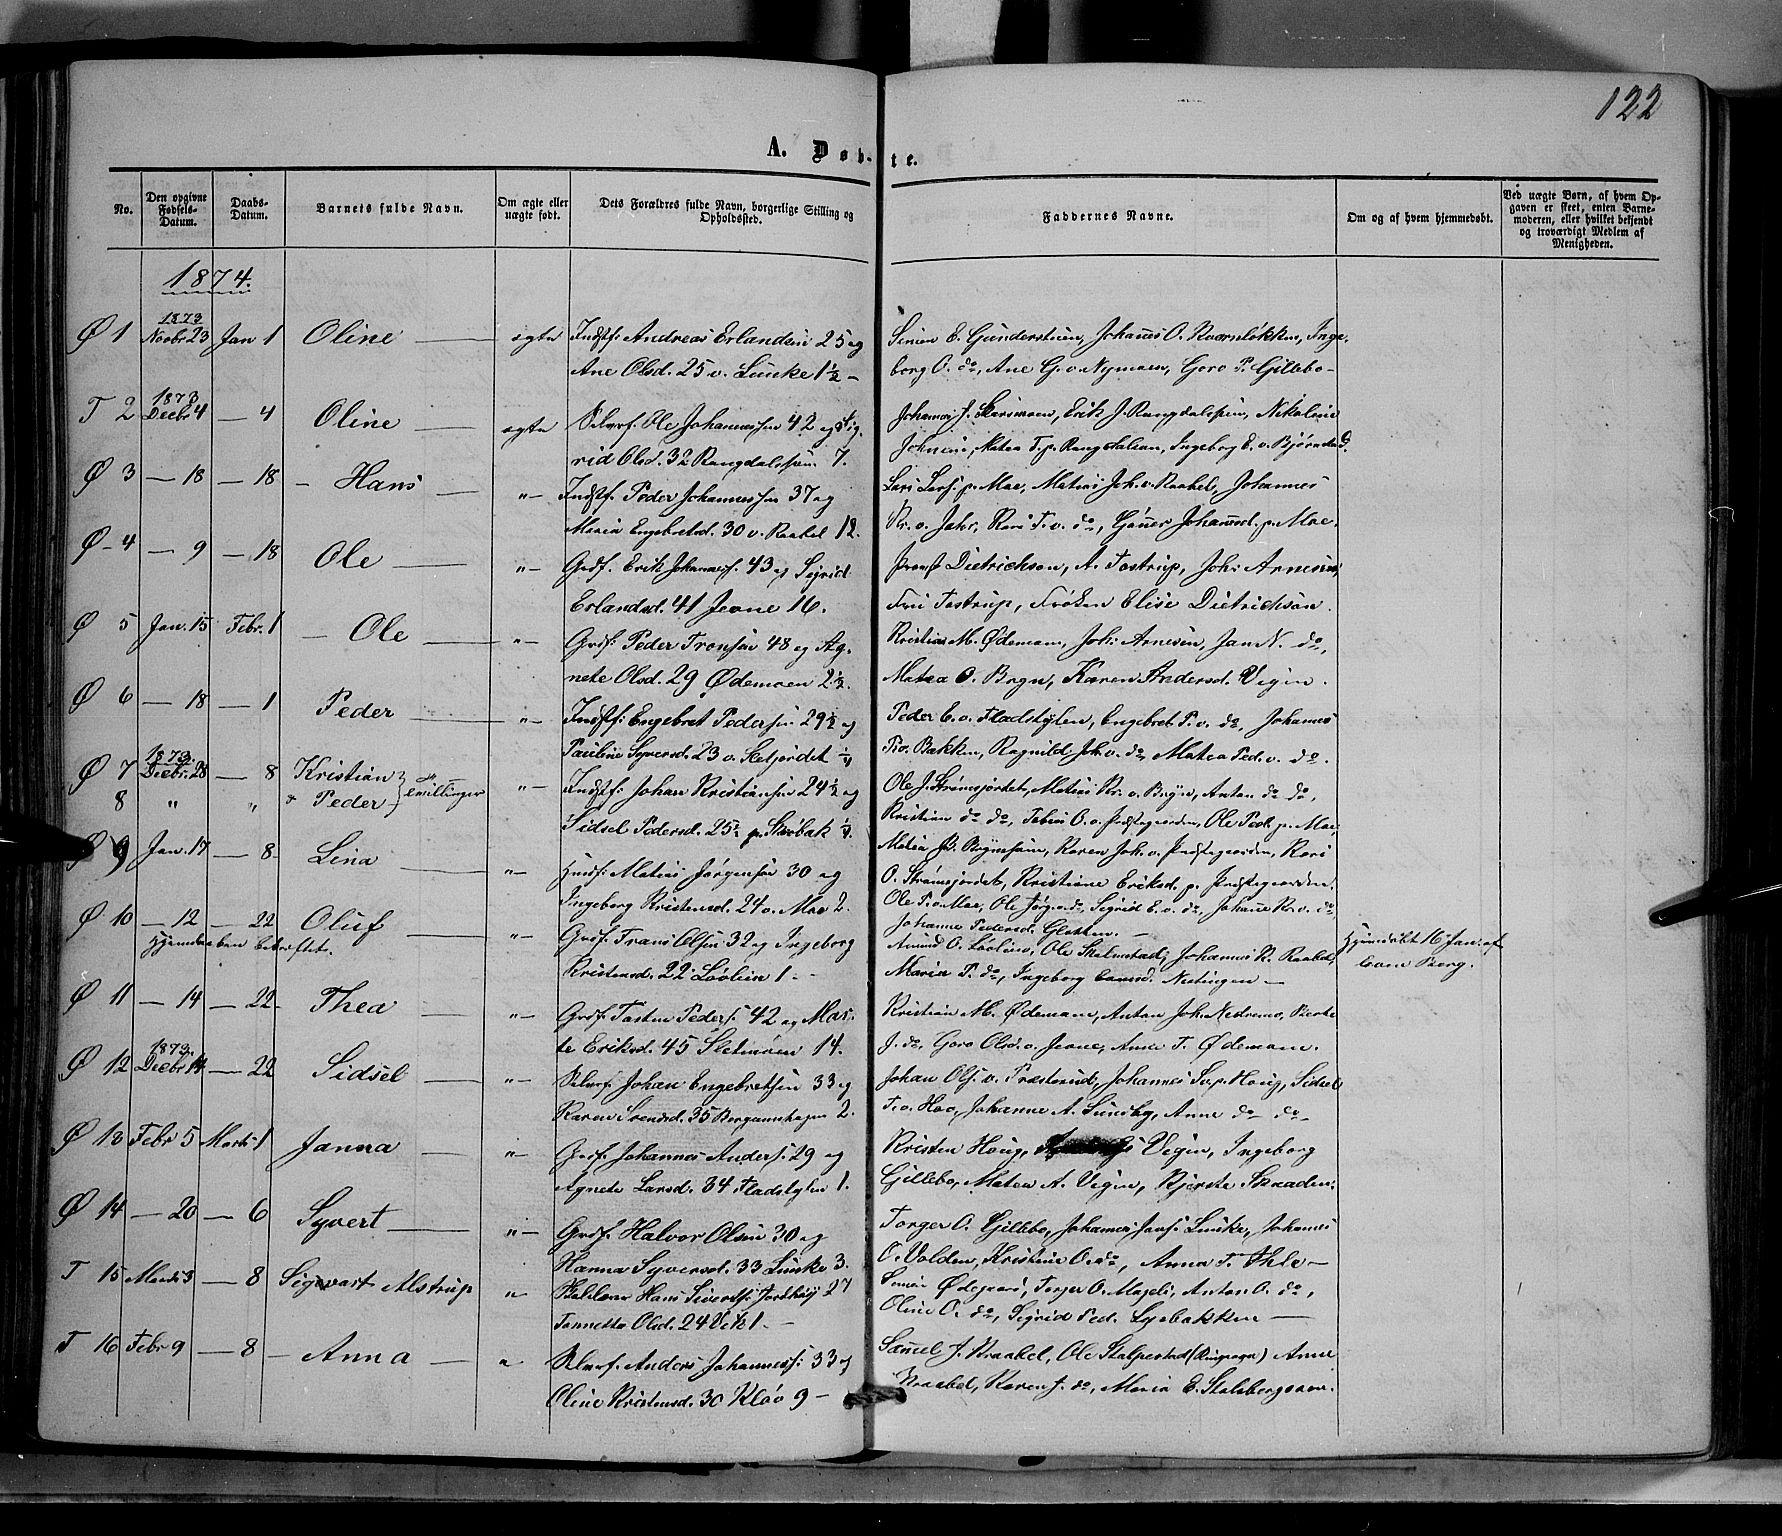 SAH, Øyer prestekontor, Ministerialbok nr. 6, 1858-1874, s. 122